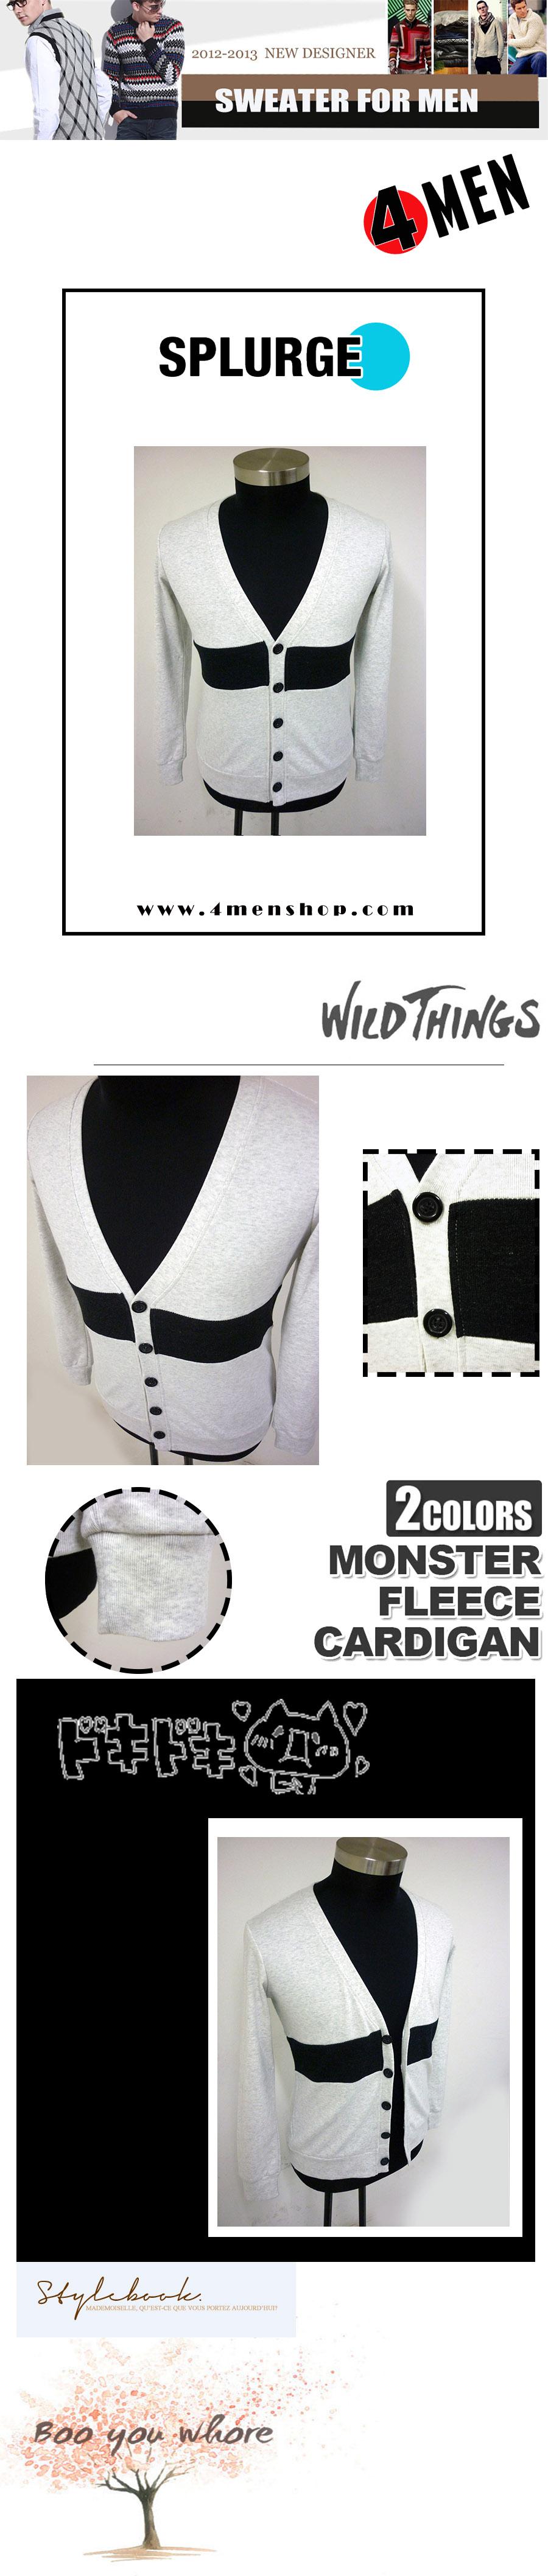 Áo khoác cardigan xám chuột ac058 - 1